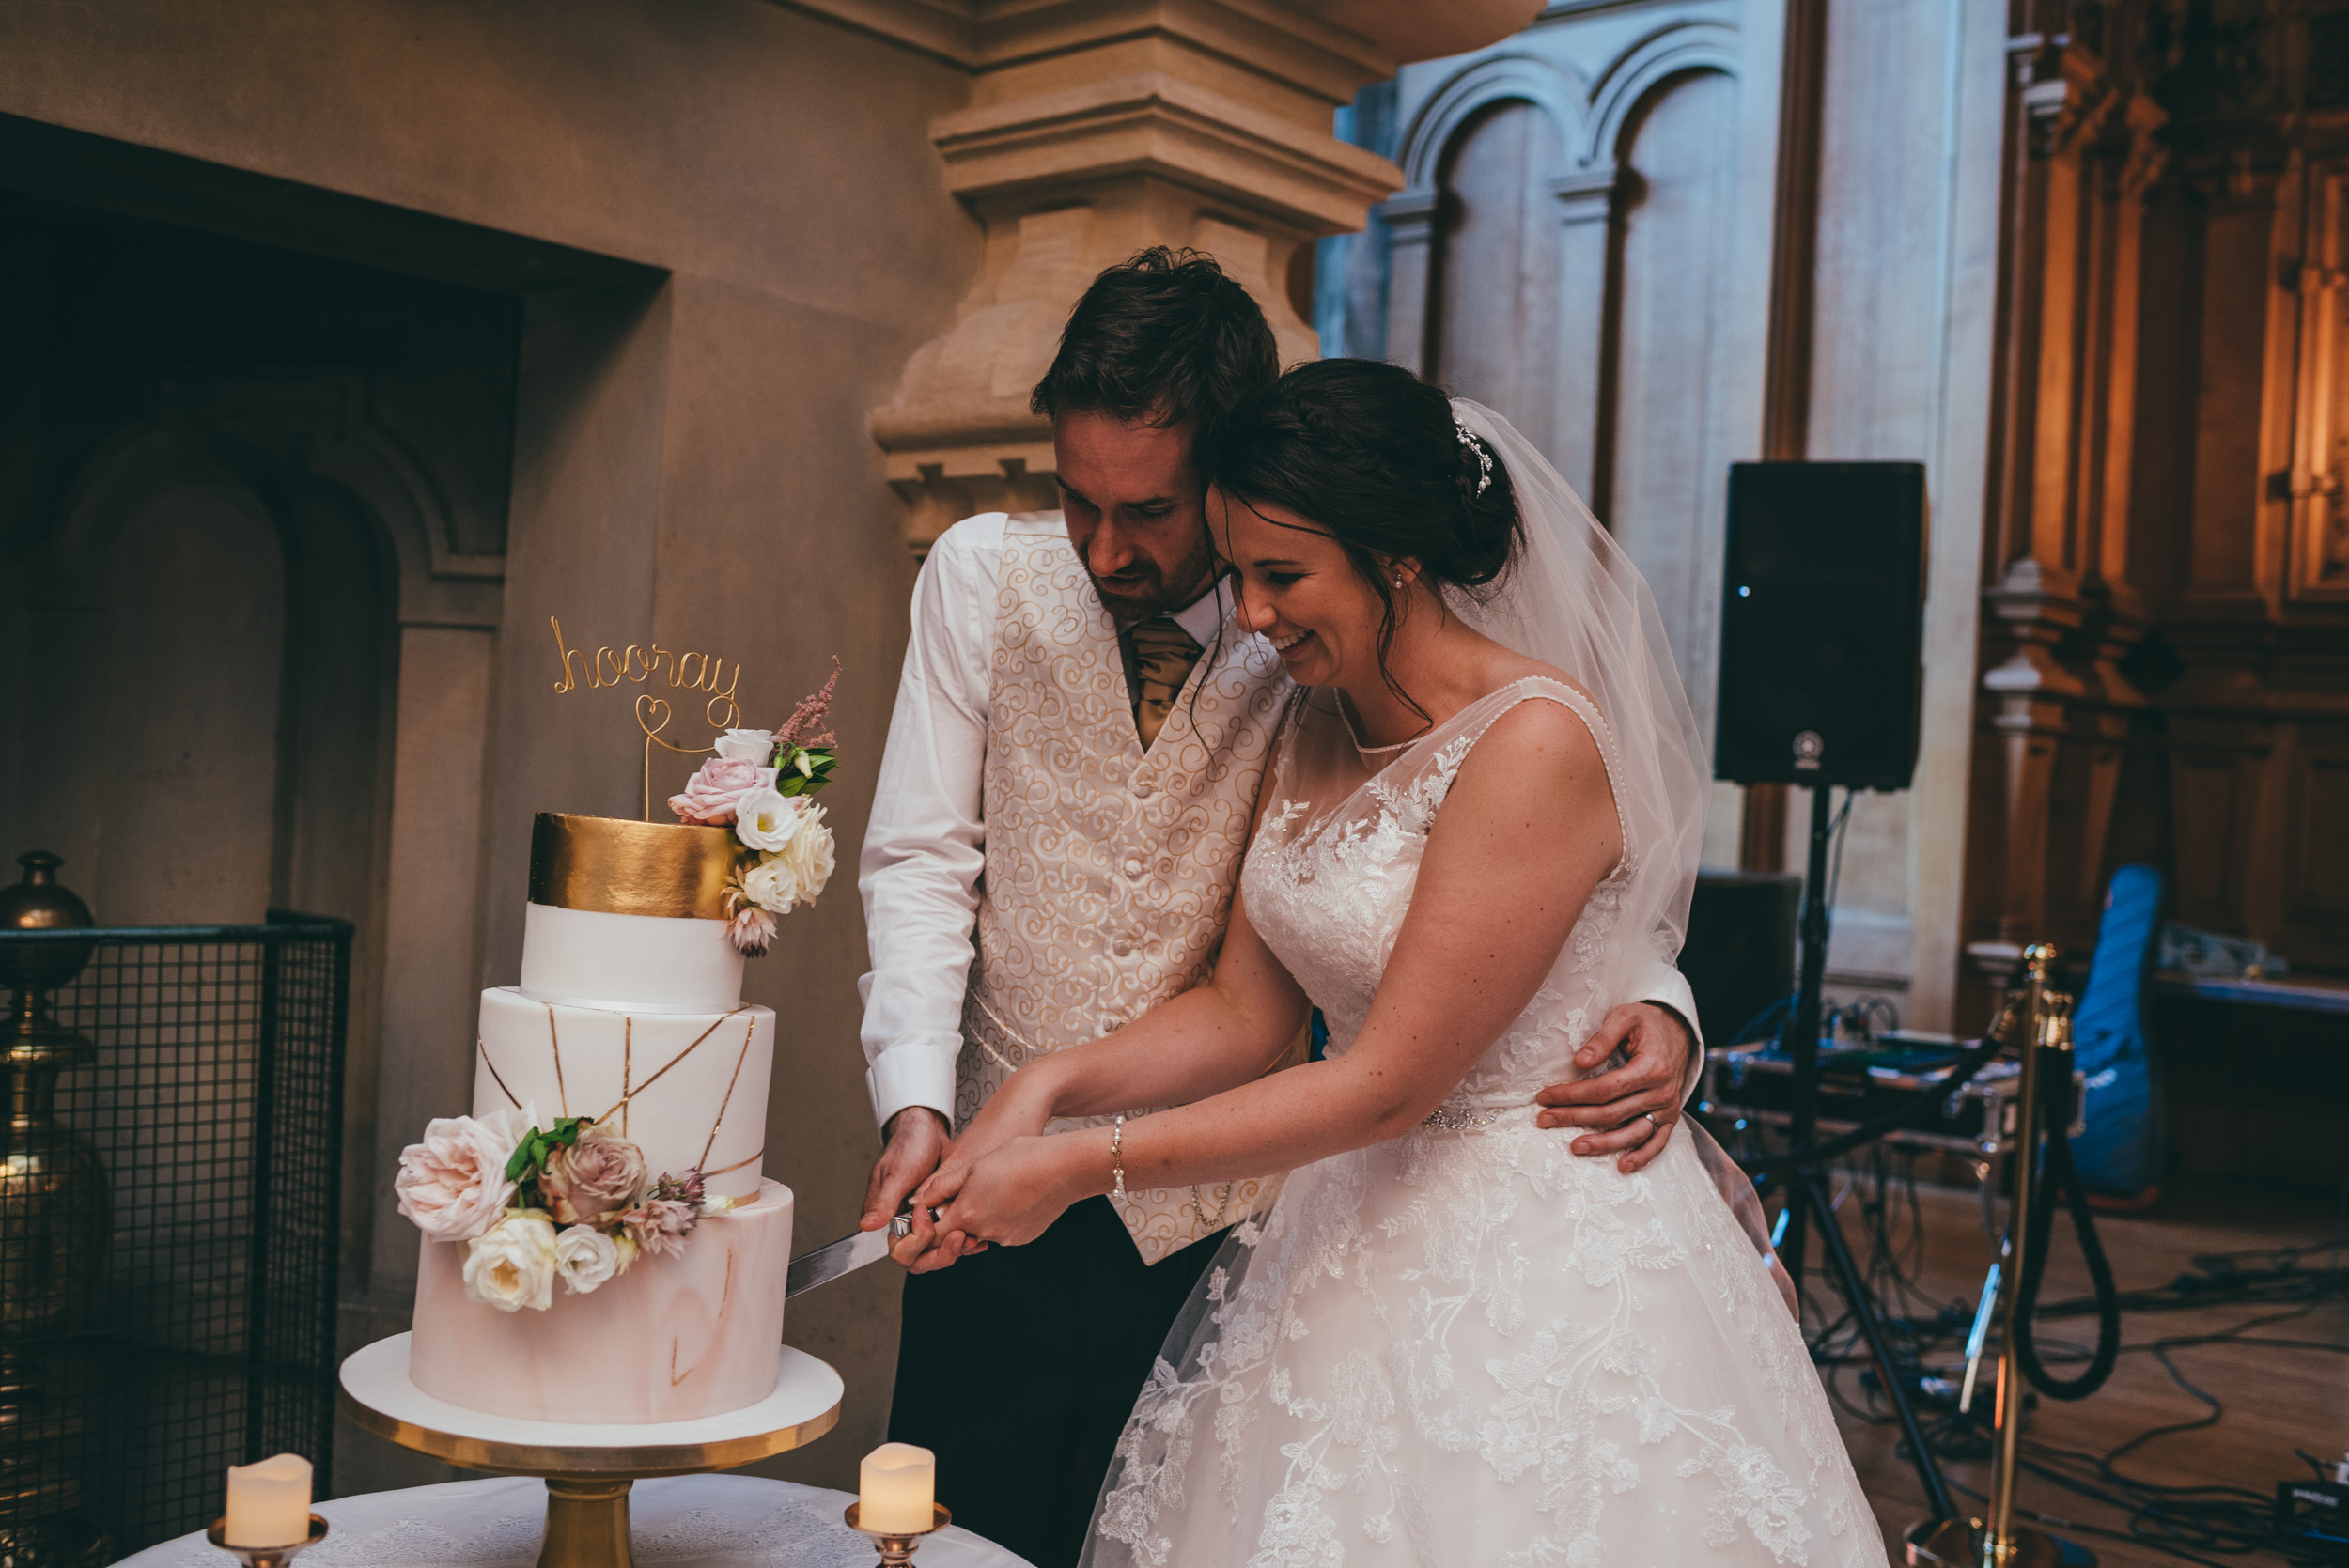 Cake cutting at Harlaxton Manor wedding